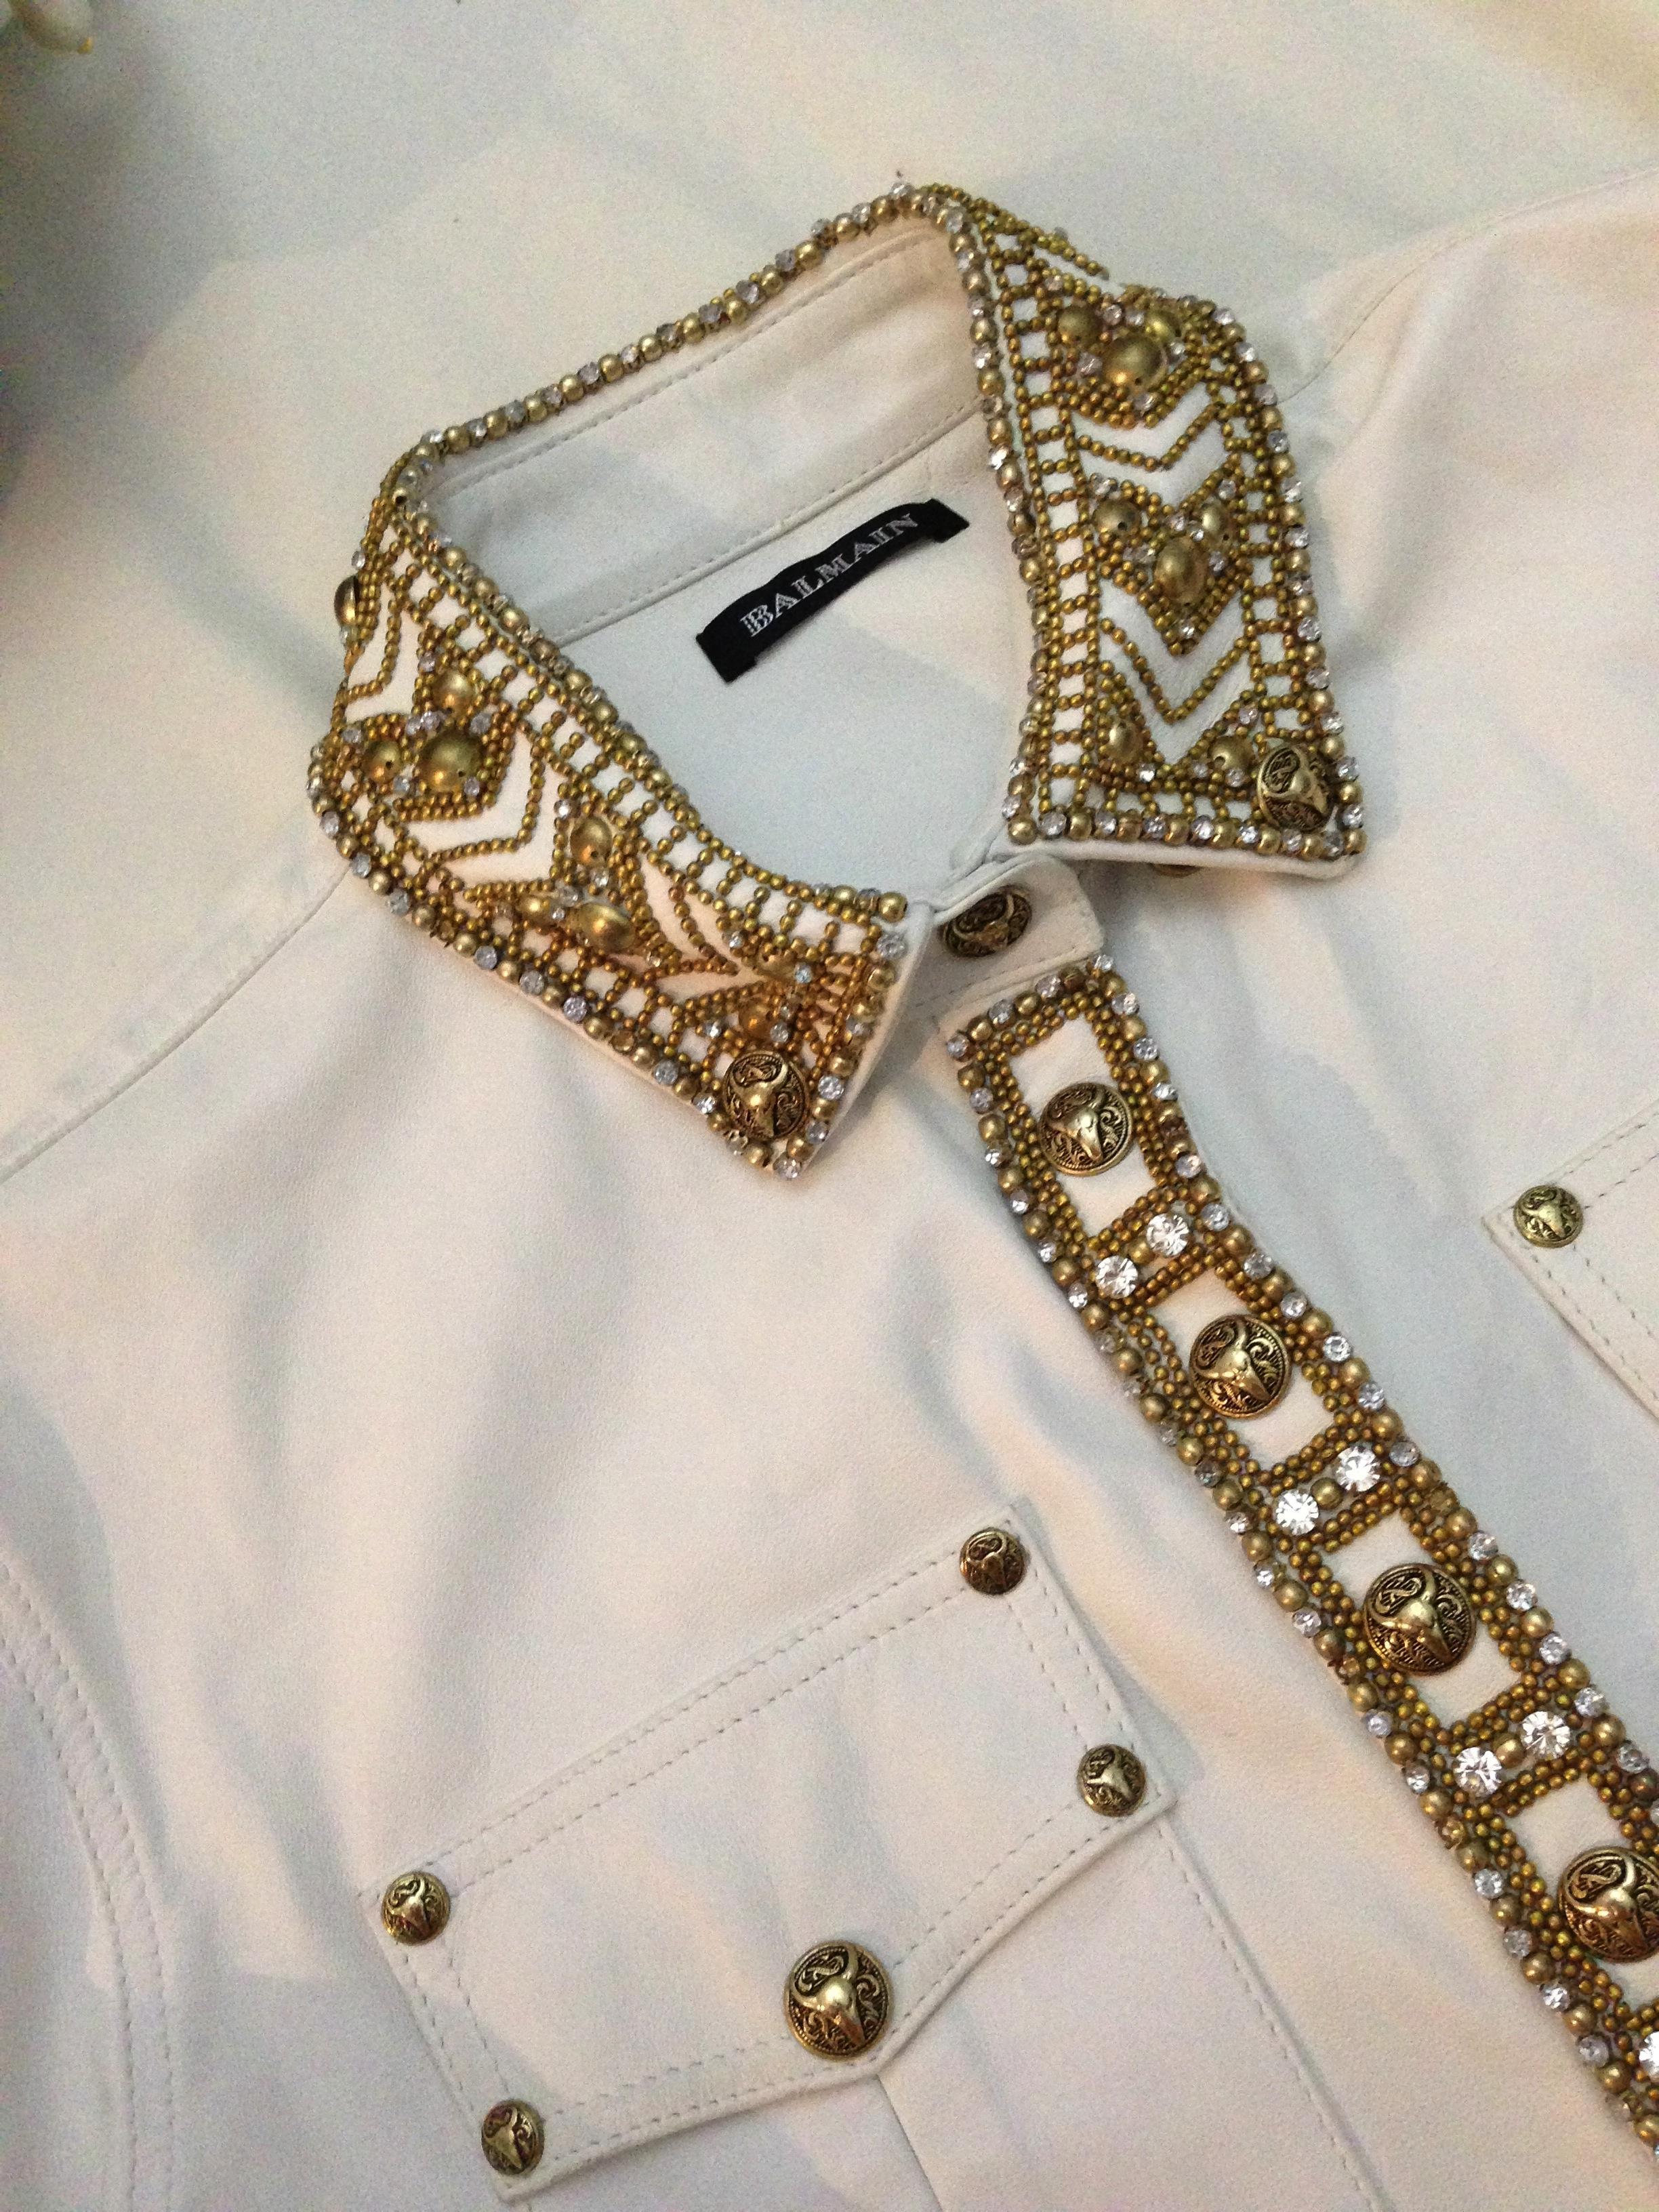 balmain leather shirt